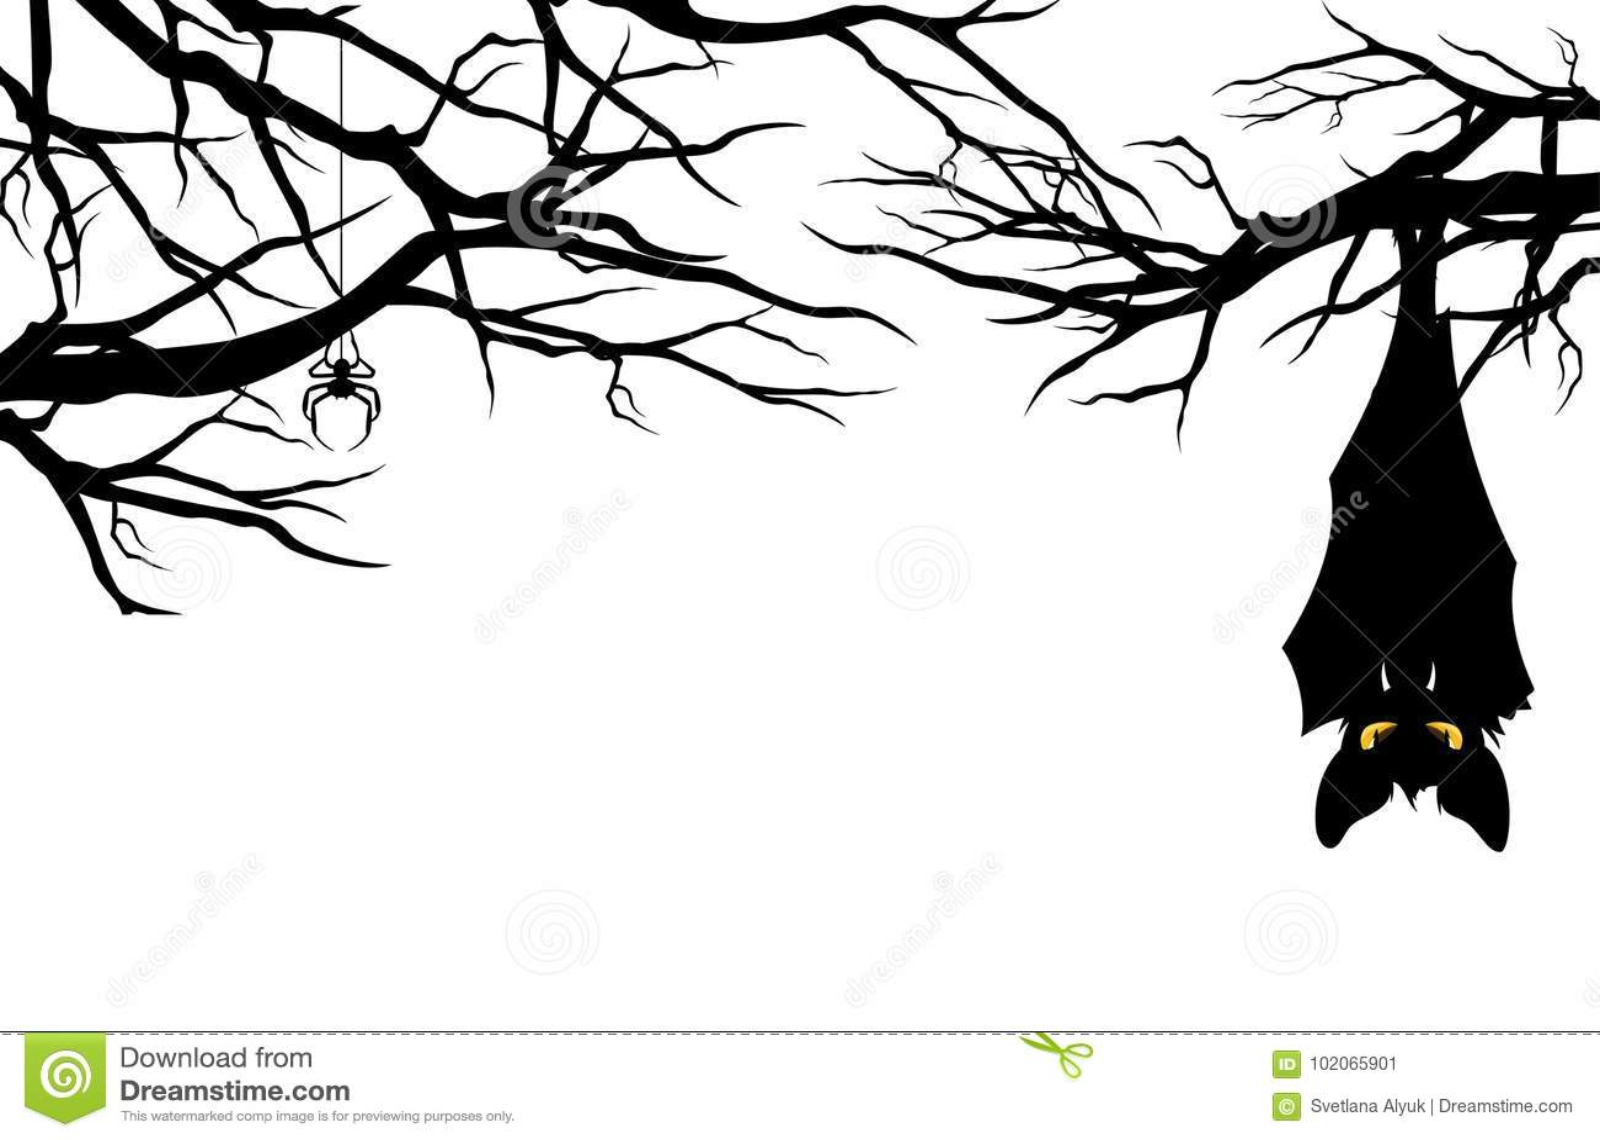 Halloween Bat Hanging Among Tree Branches Vector Stock